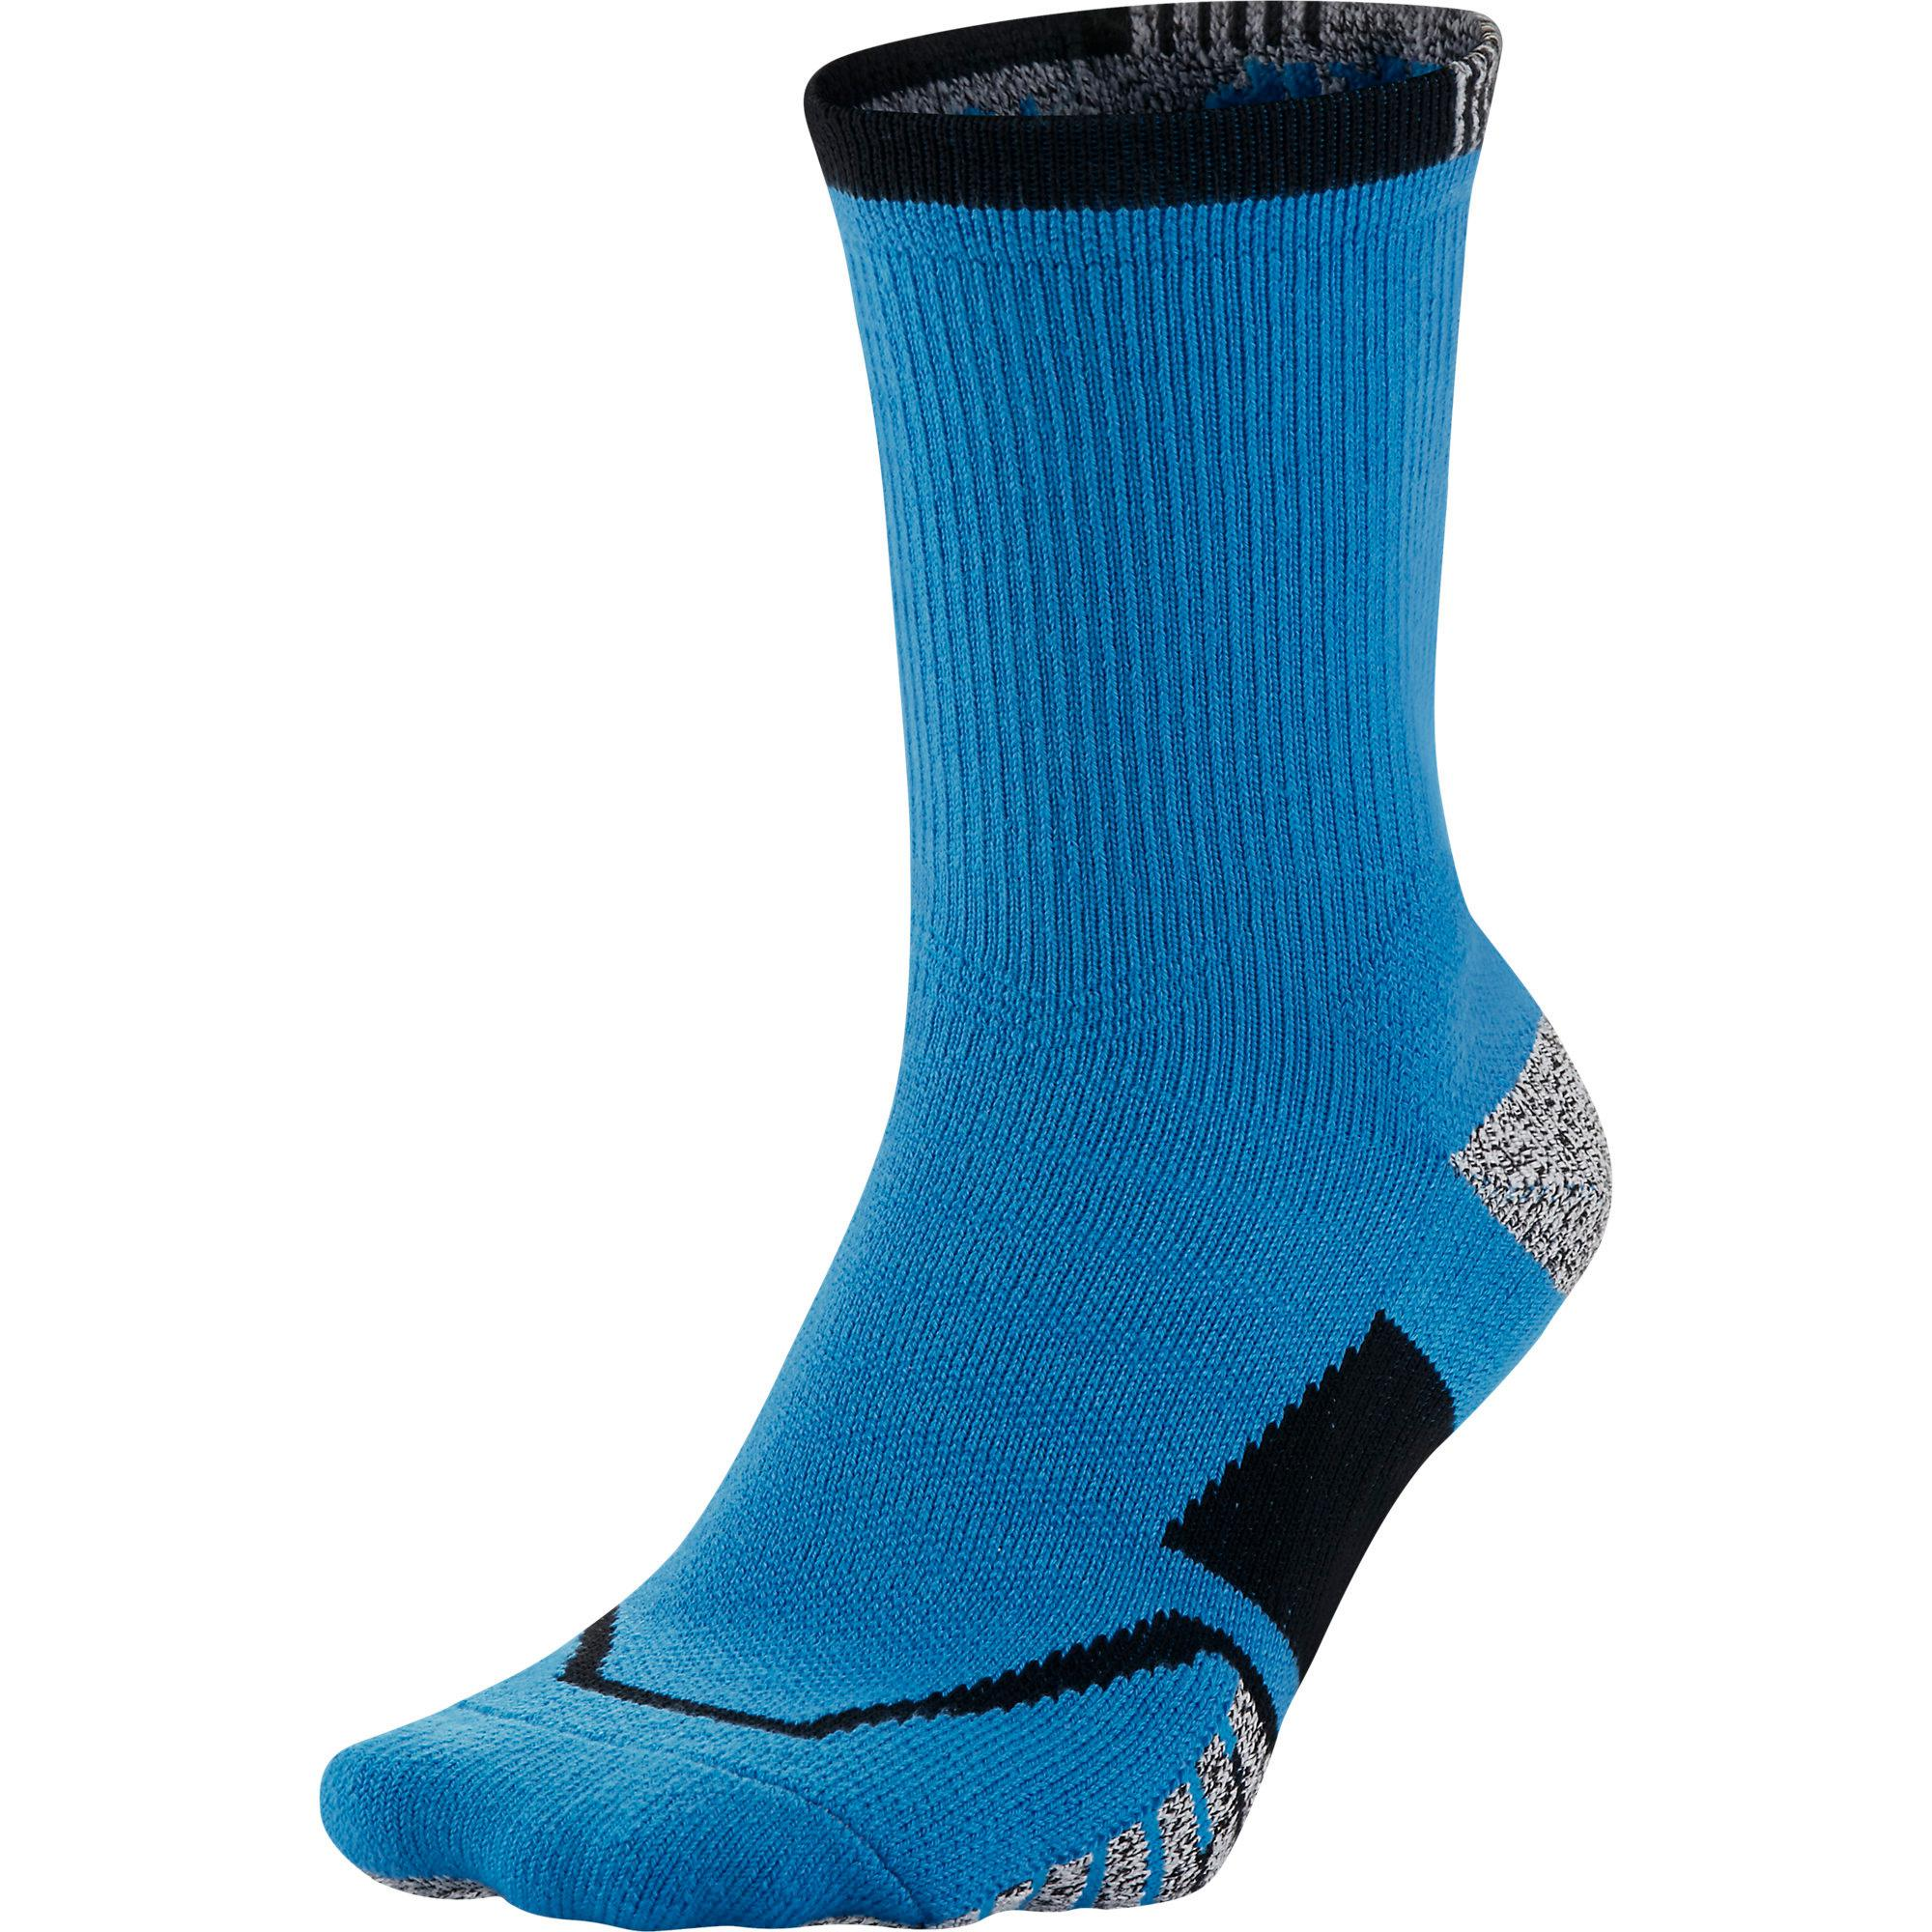 ae9910dc8 Nike Grip Elite Crew Tennis Socks (1 Pair) - Light Photo Blue -  Tennisnuts.com